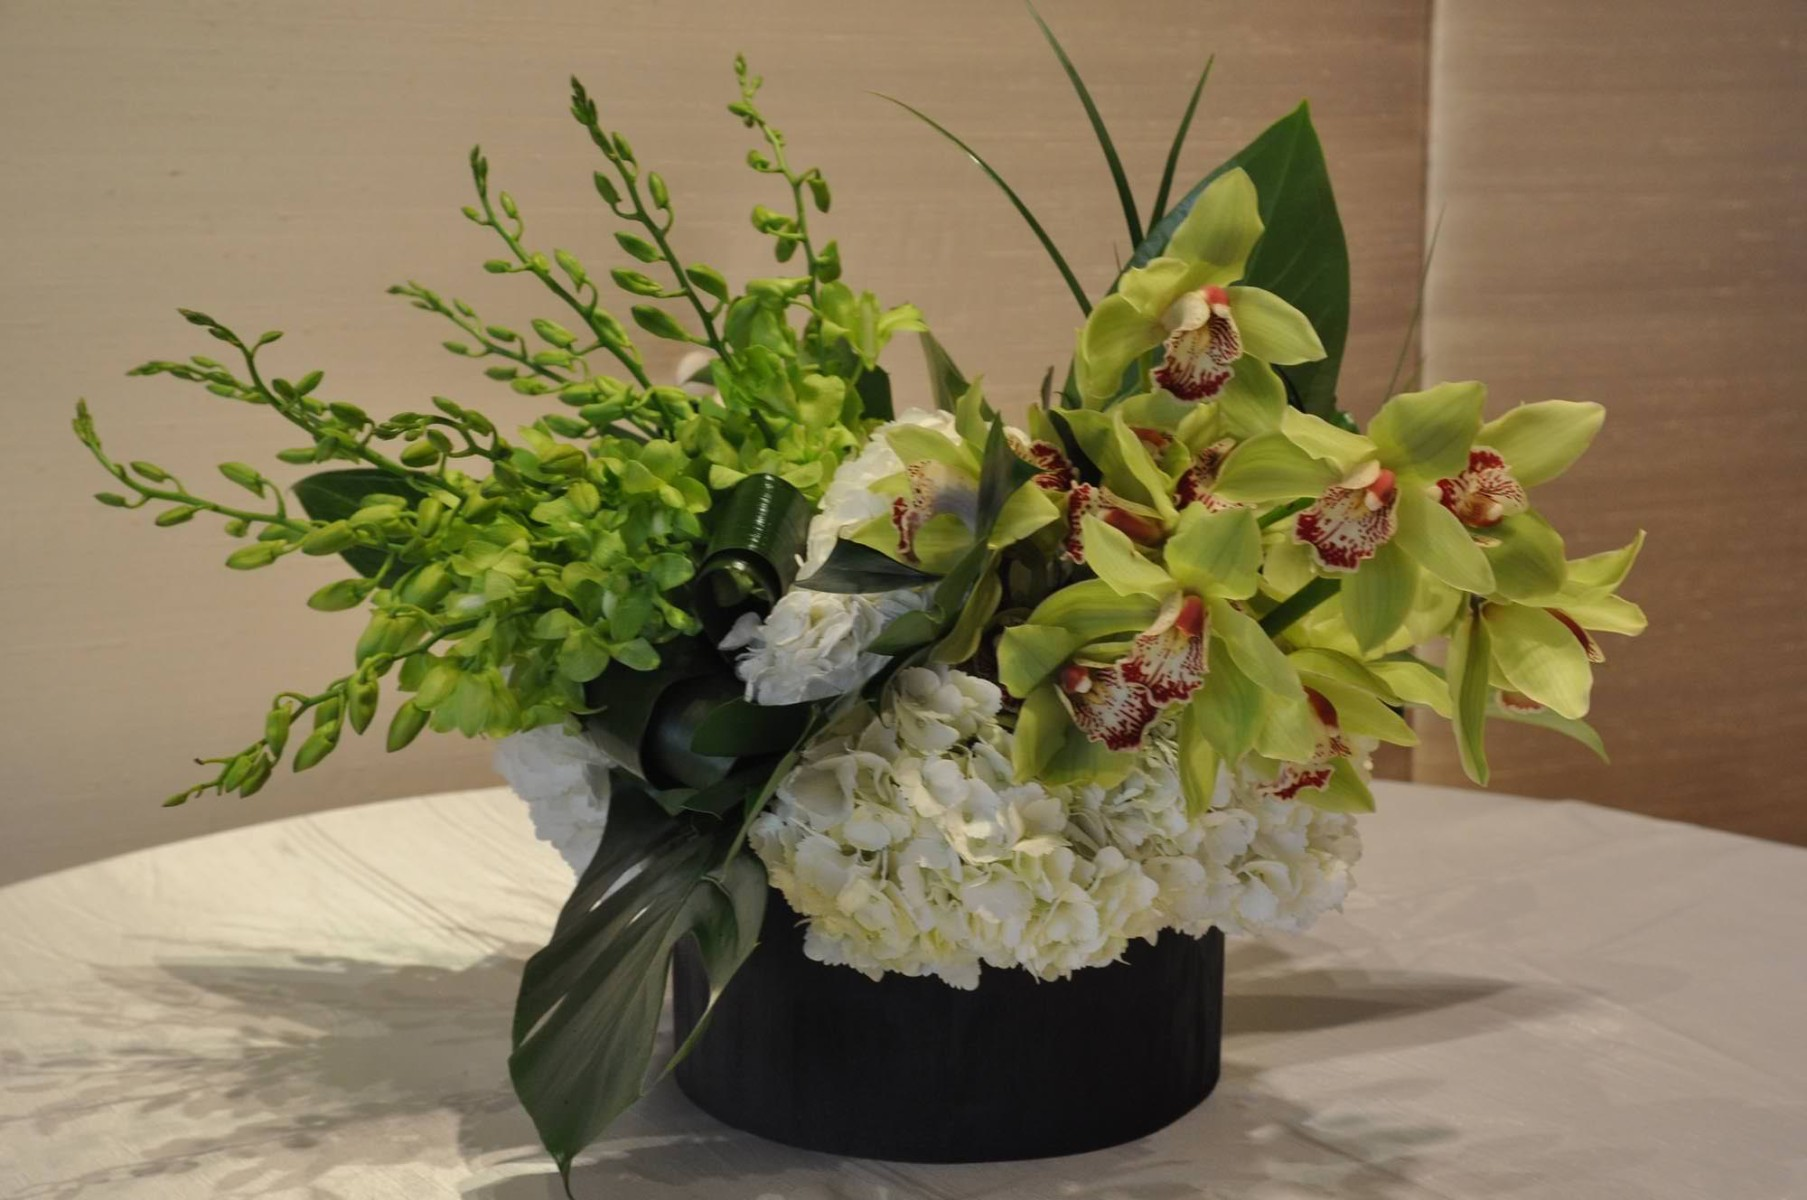 nisies-enchanted-florist-orange-county-floral-arrangments-21